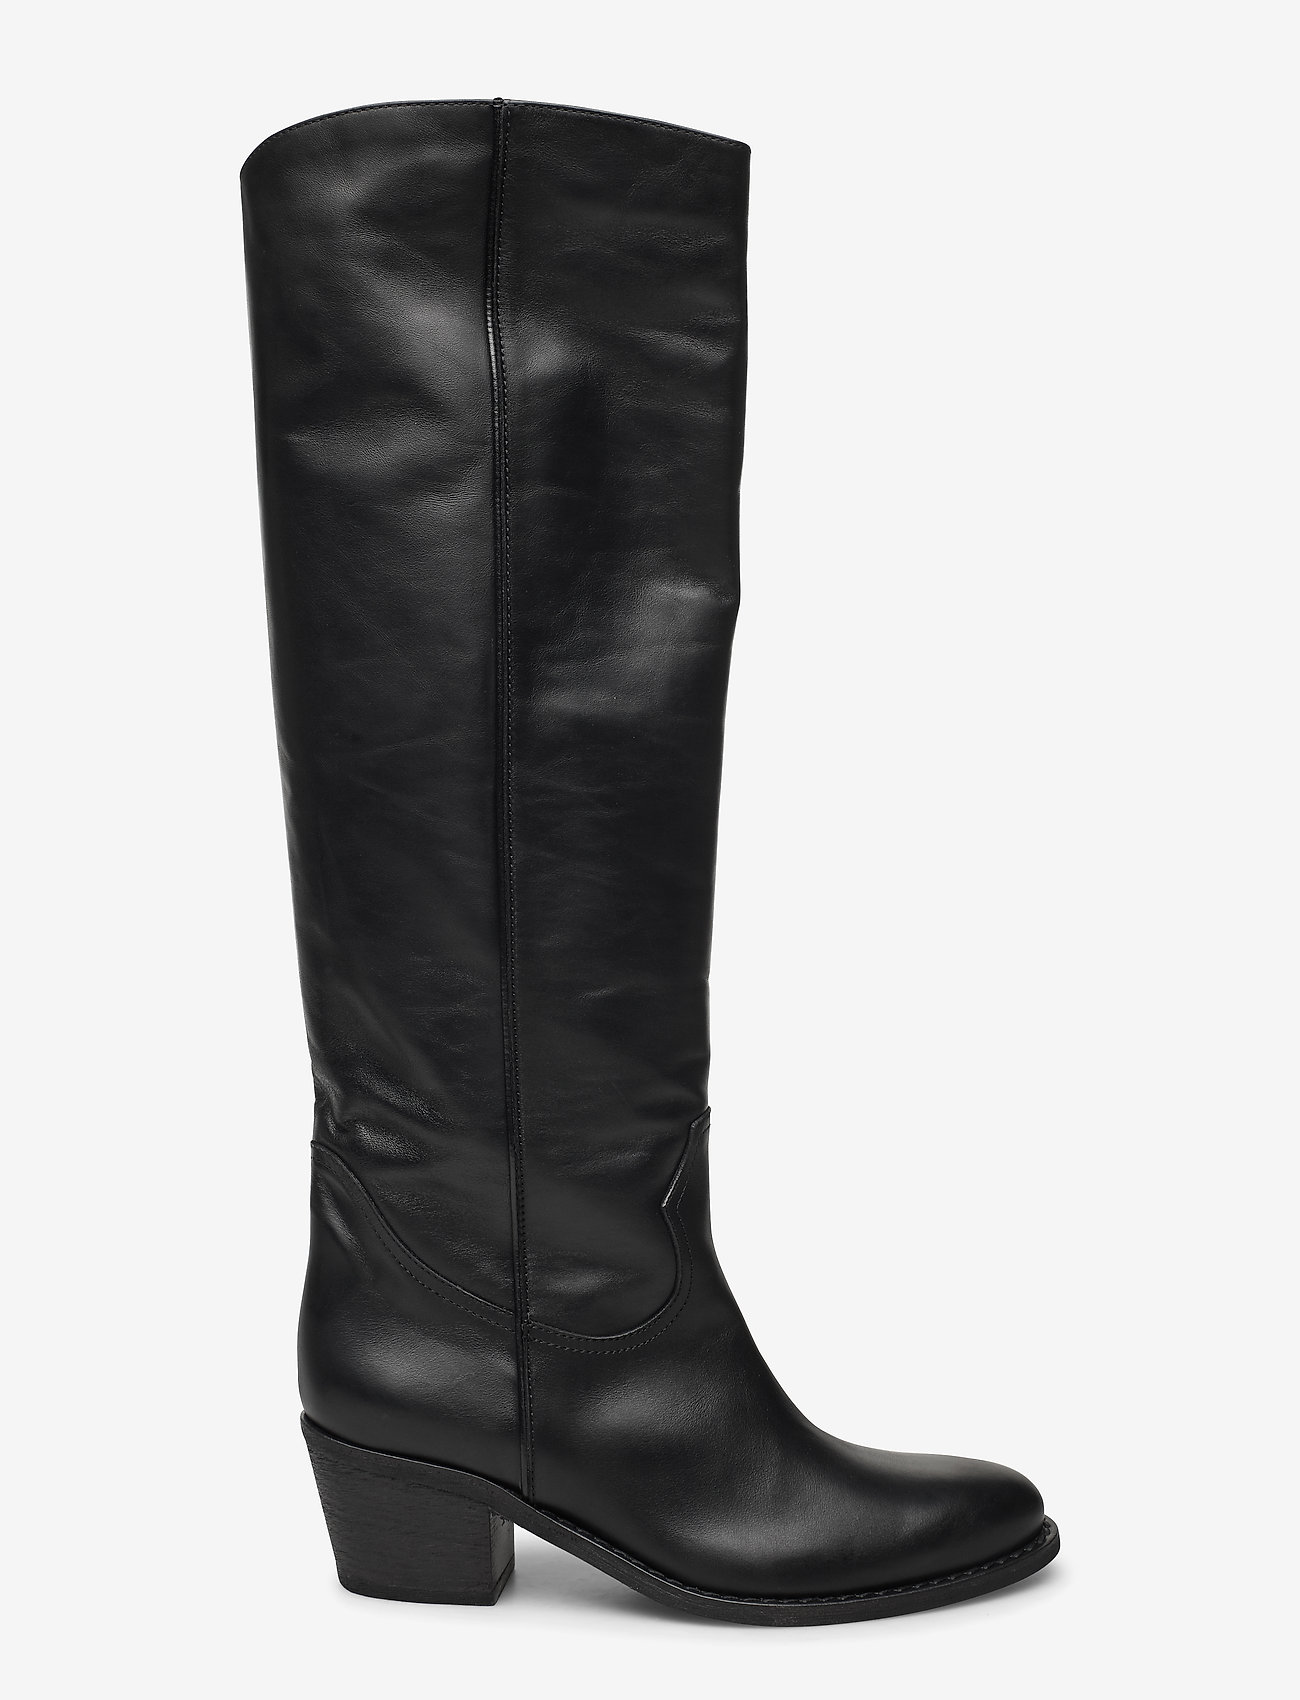 Anca (Black Leather) (4600 kr) NOTABENE |